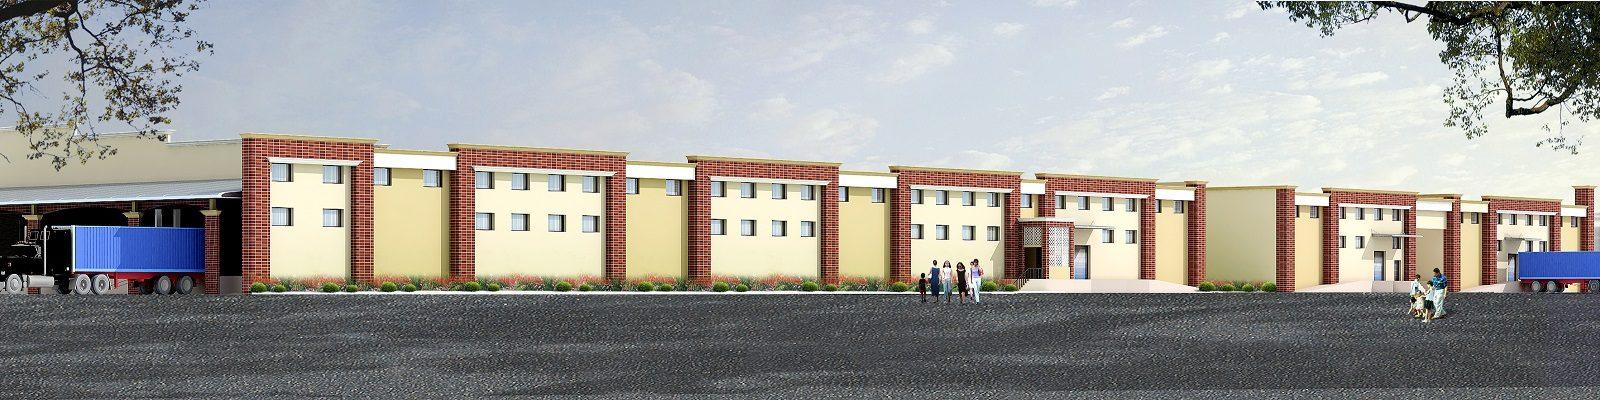 Haryana Liquors Pvt Ltd at Karnal